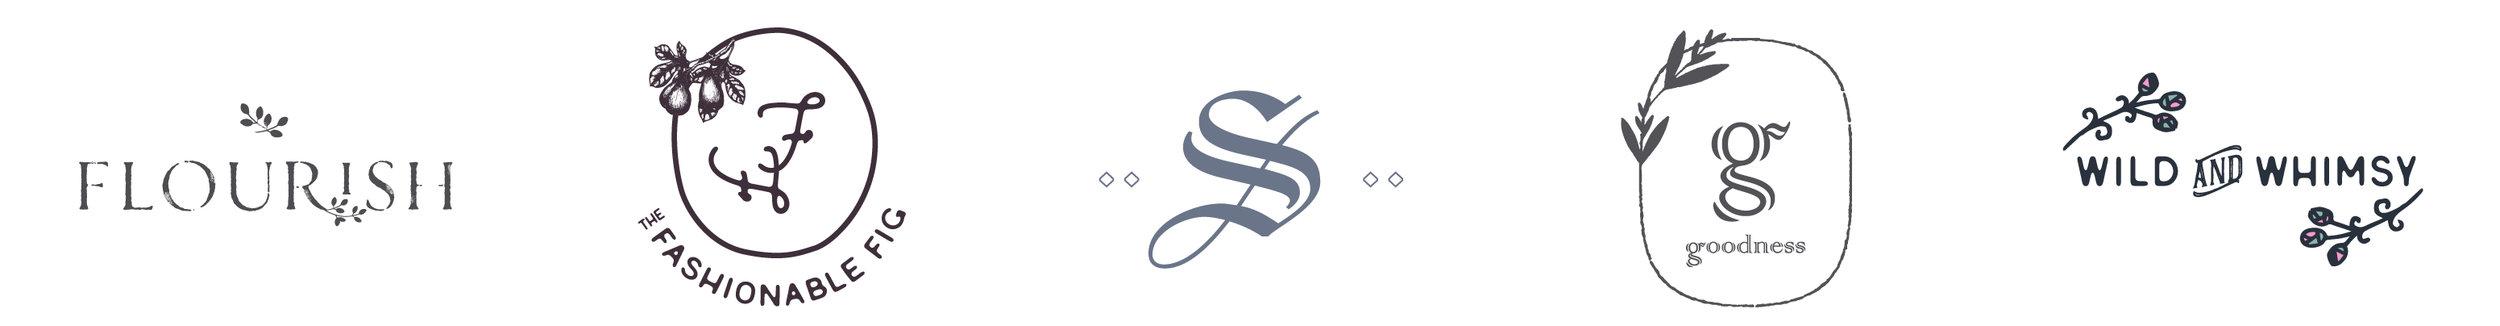 logo-sampling_final2.jpg